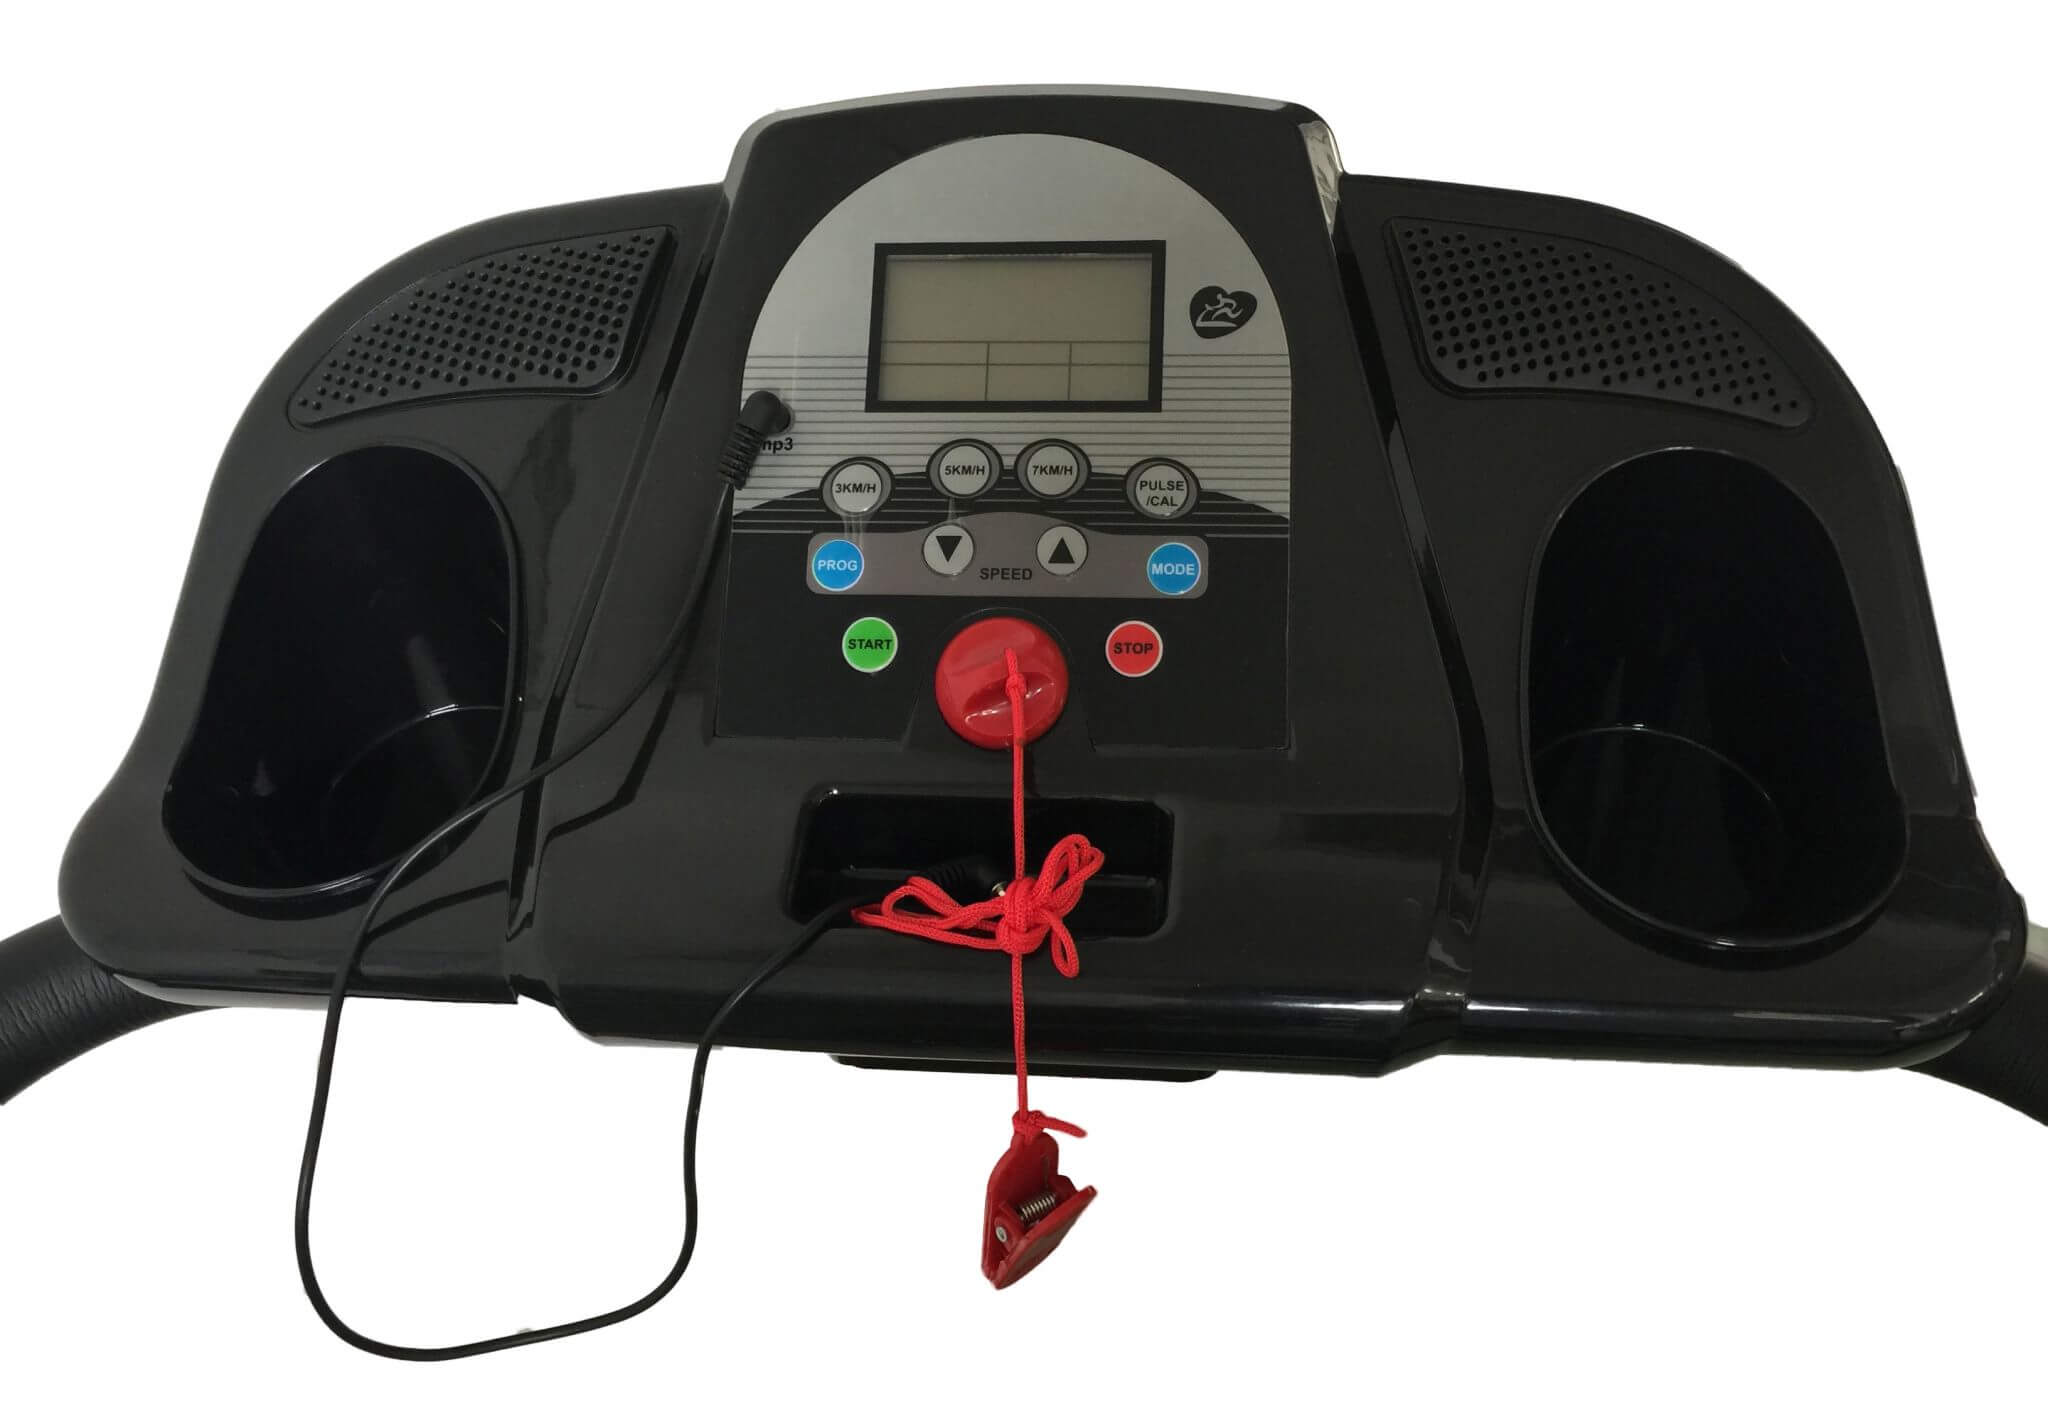 nrg massage chair child sized chairs buy folding power pro fitness motorized treadmill ireland